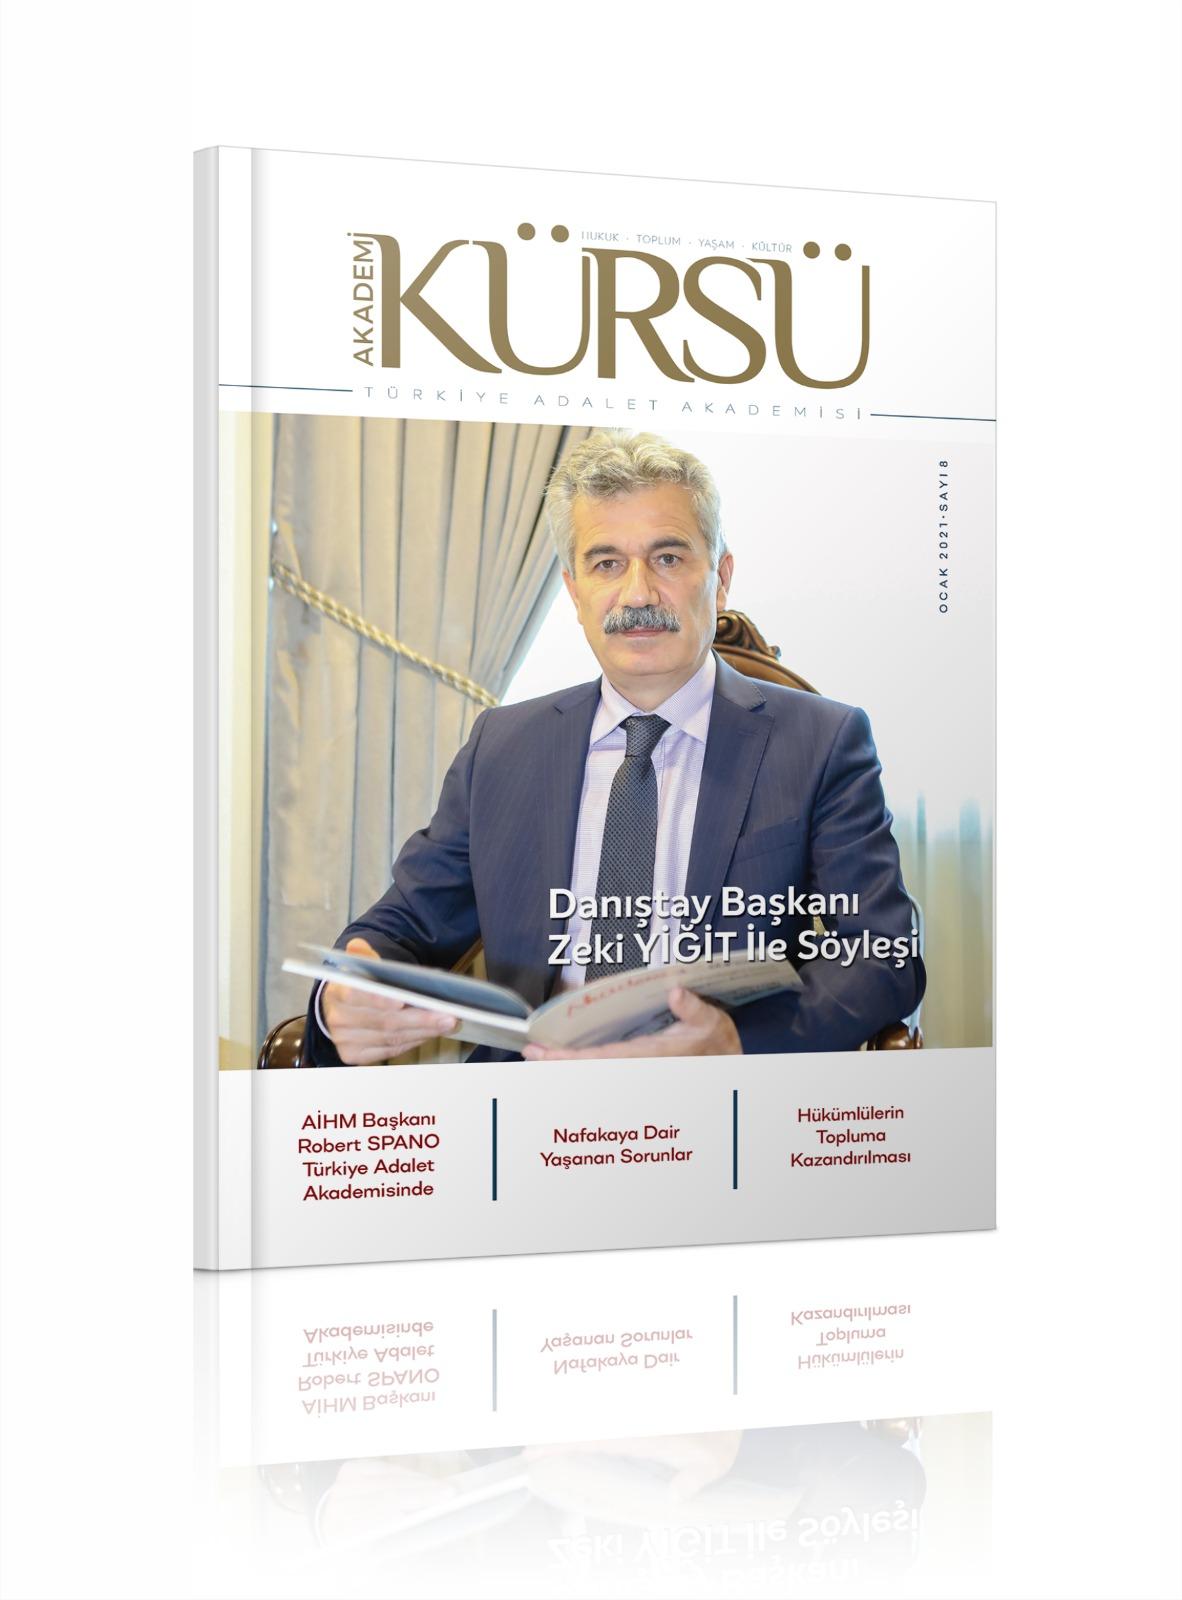 turkiye adalet akademisi